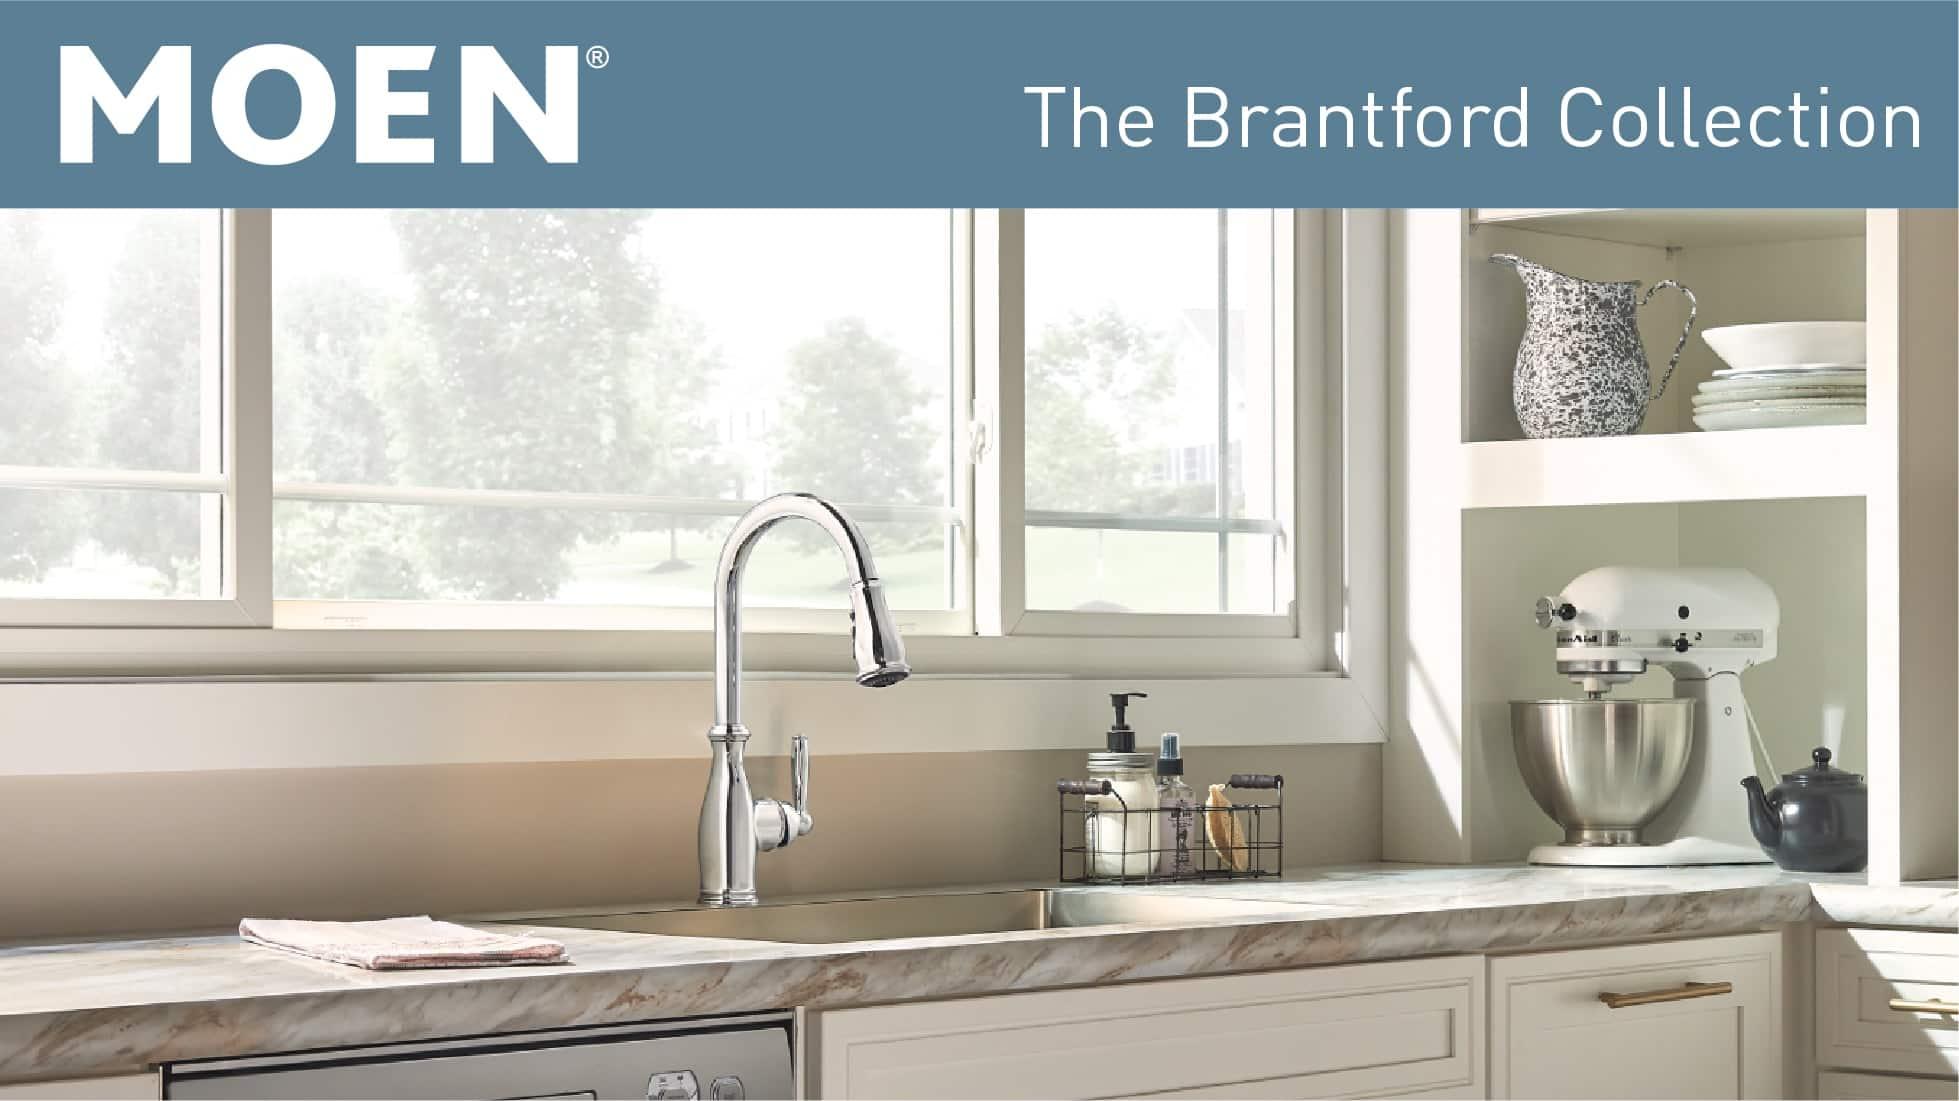 Brantford Collection